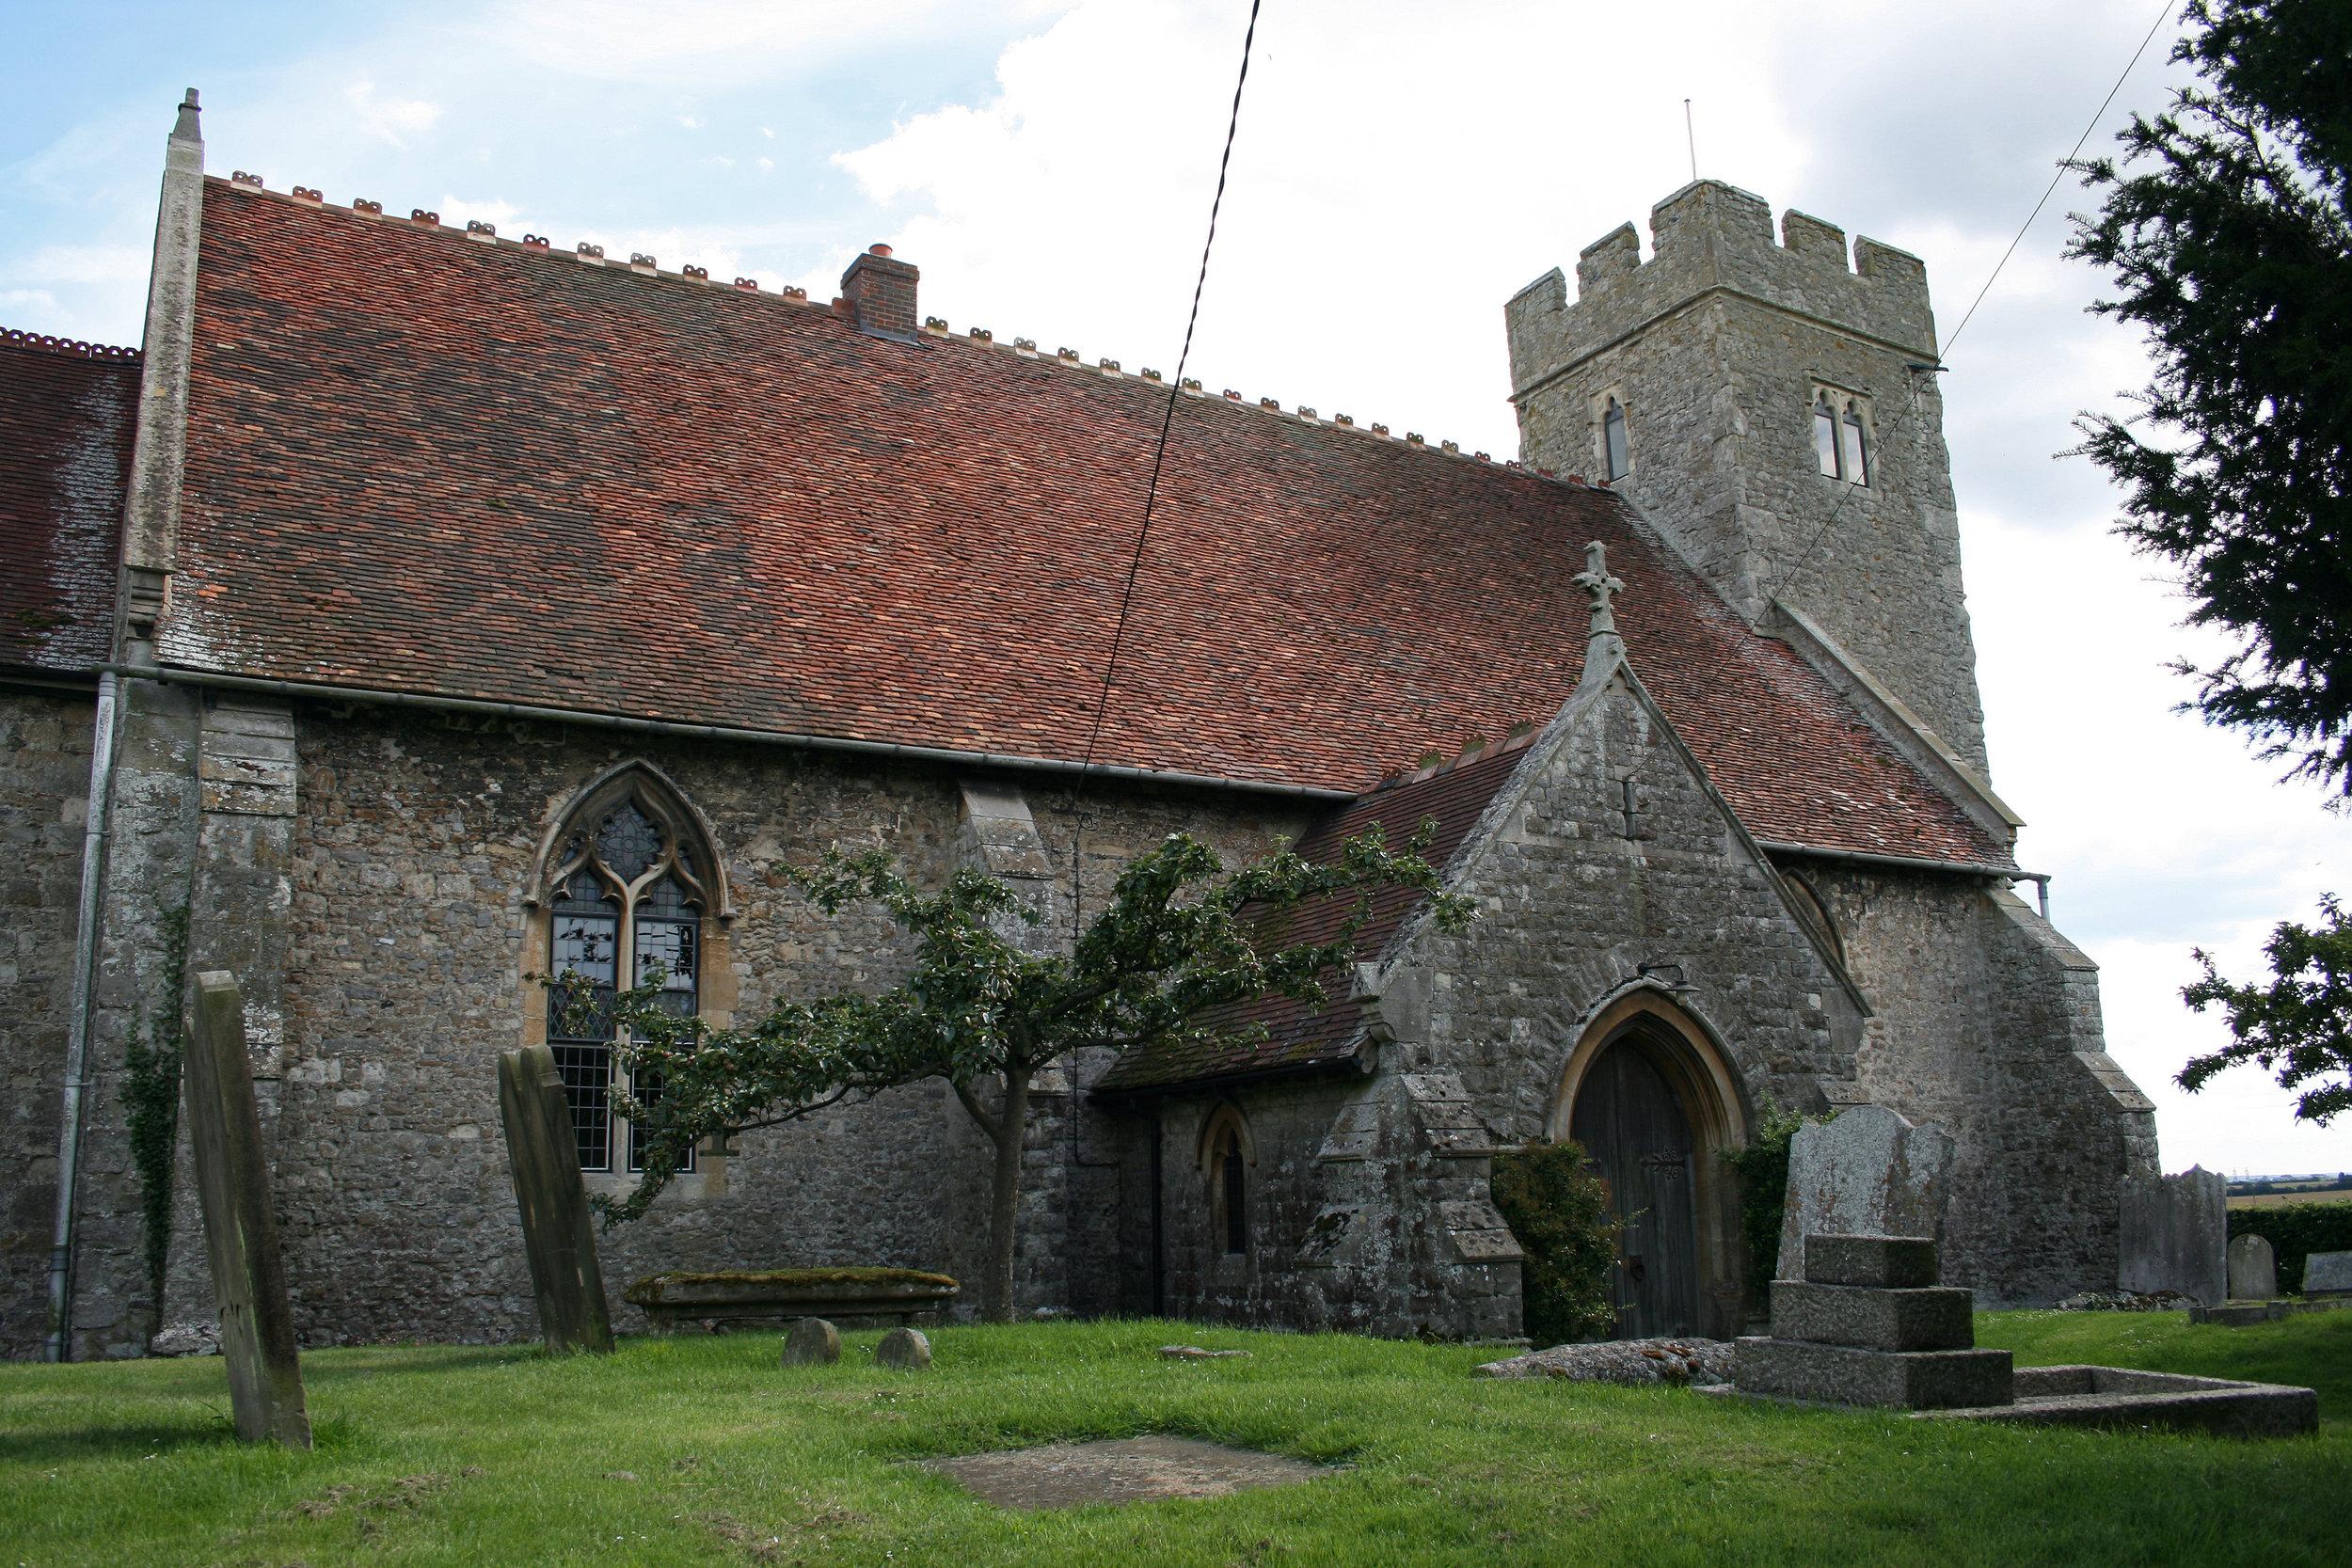 Former_Church_at_St_Mary_Hoo,_Kent.jpg